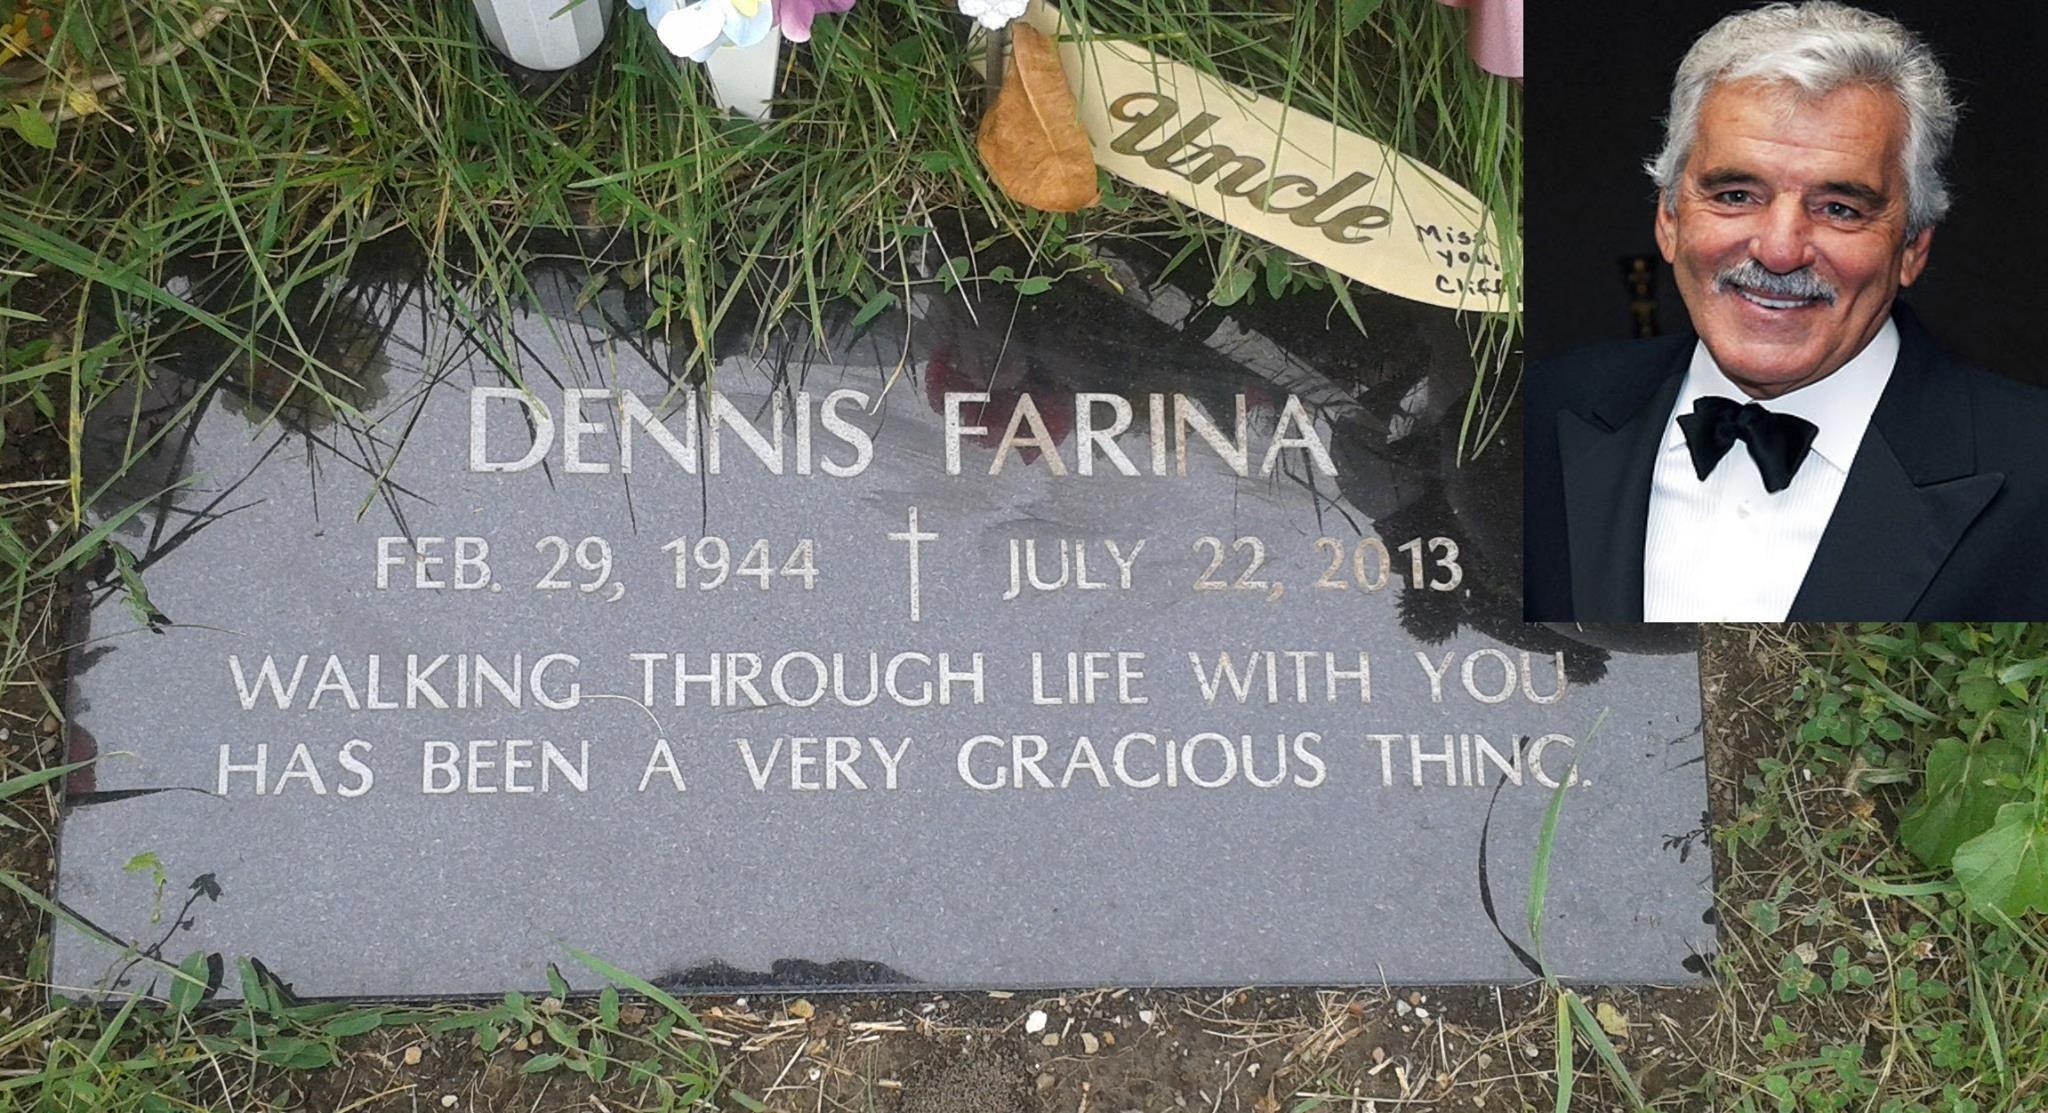 Dennis Farina (February 29, 1944 – July 22, 2013) He was a